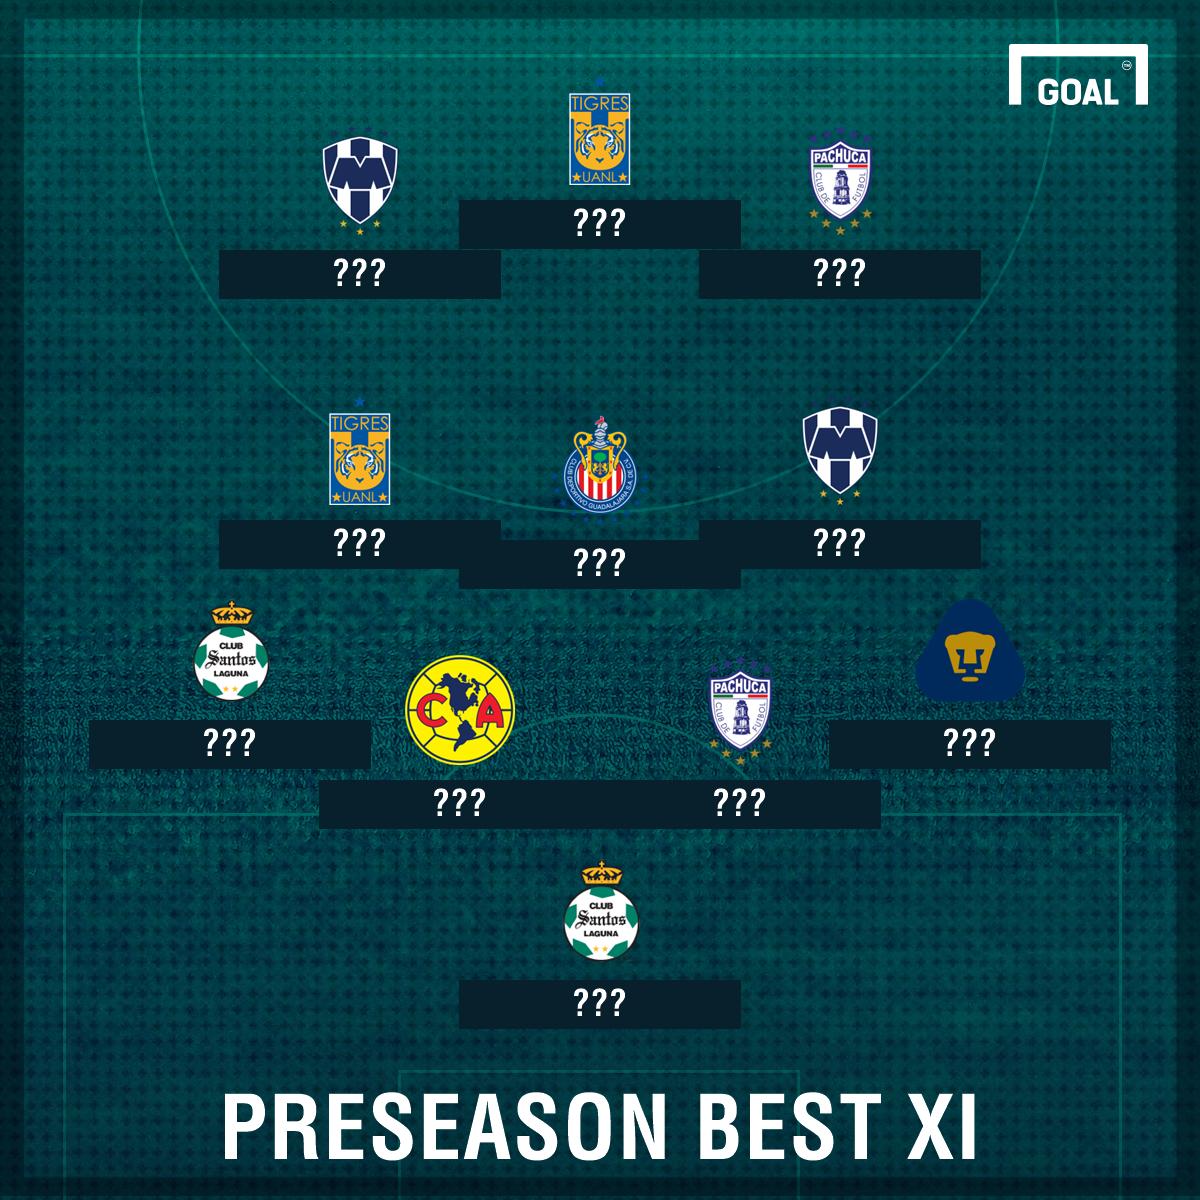 Goal Liga MX preseason best xi mystery